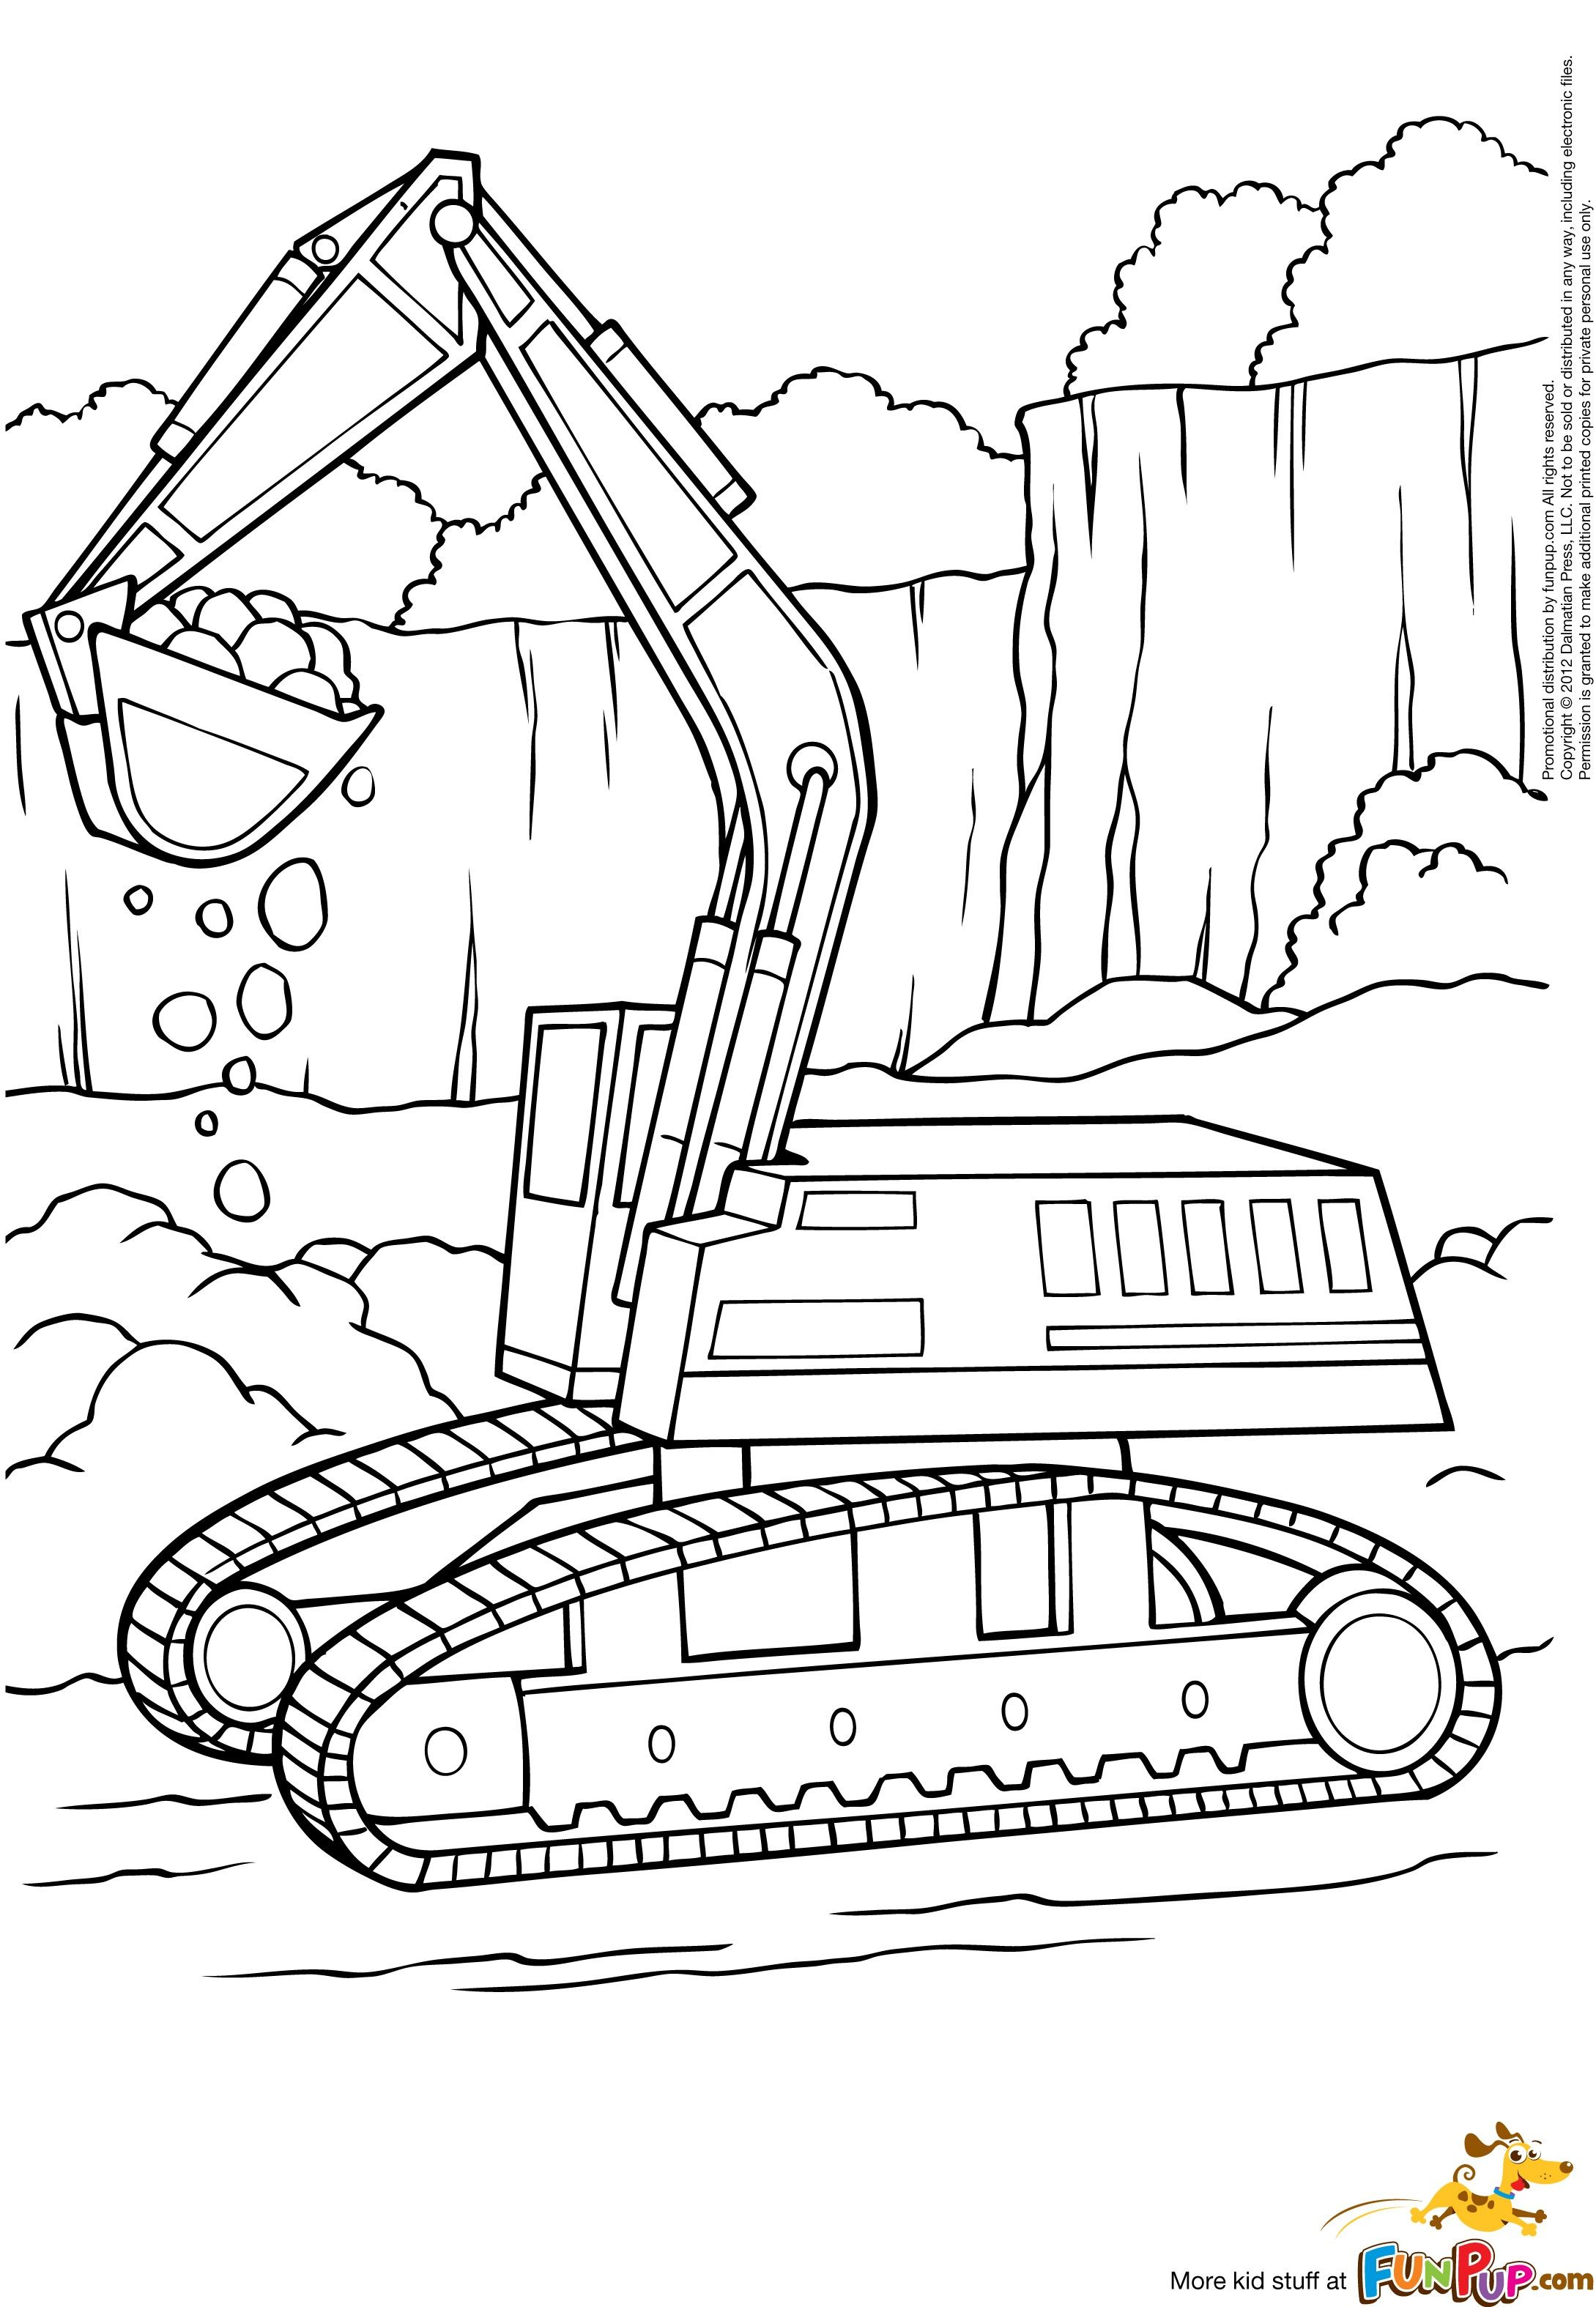 Excavator coloring pages Boyama sayfaları, Alfabe boyama